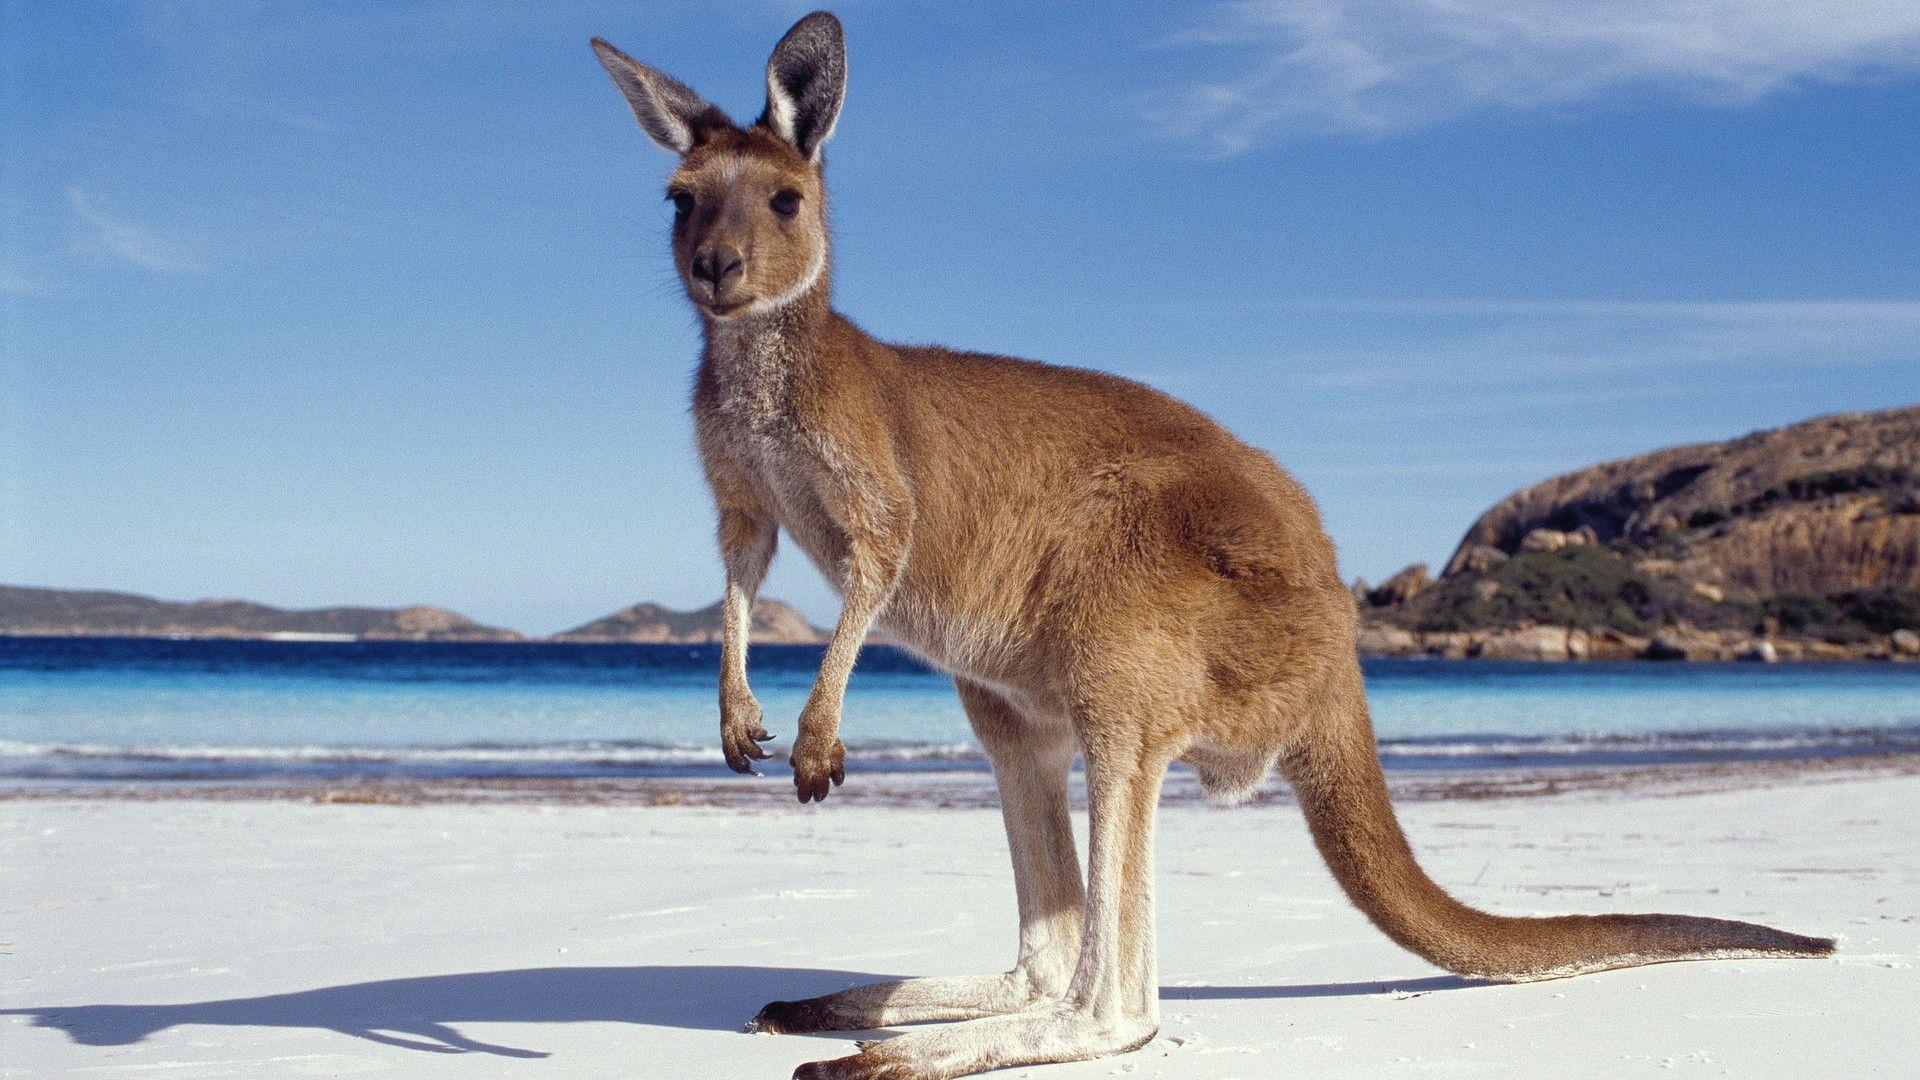 Kangaroo HD Wallpapers - HD Wallpapers Inn